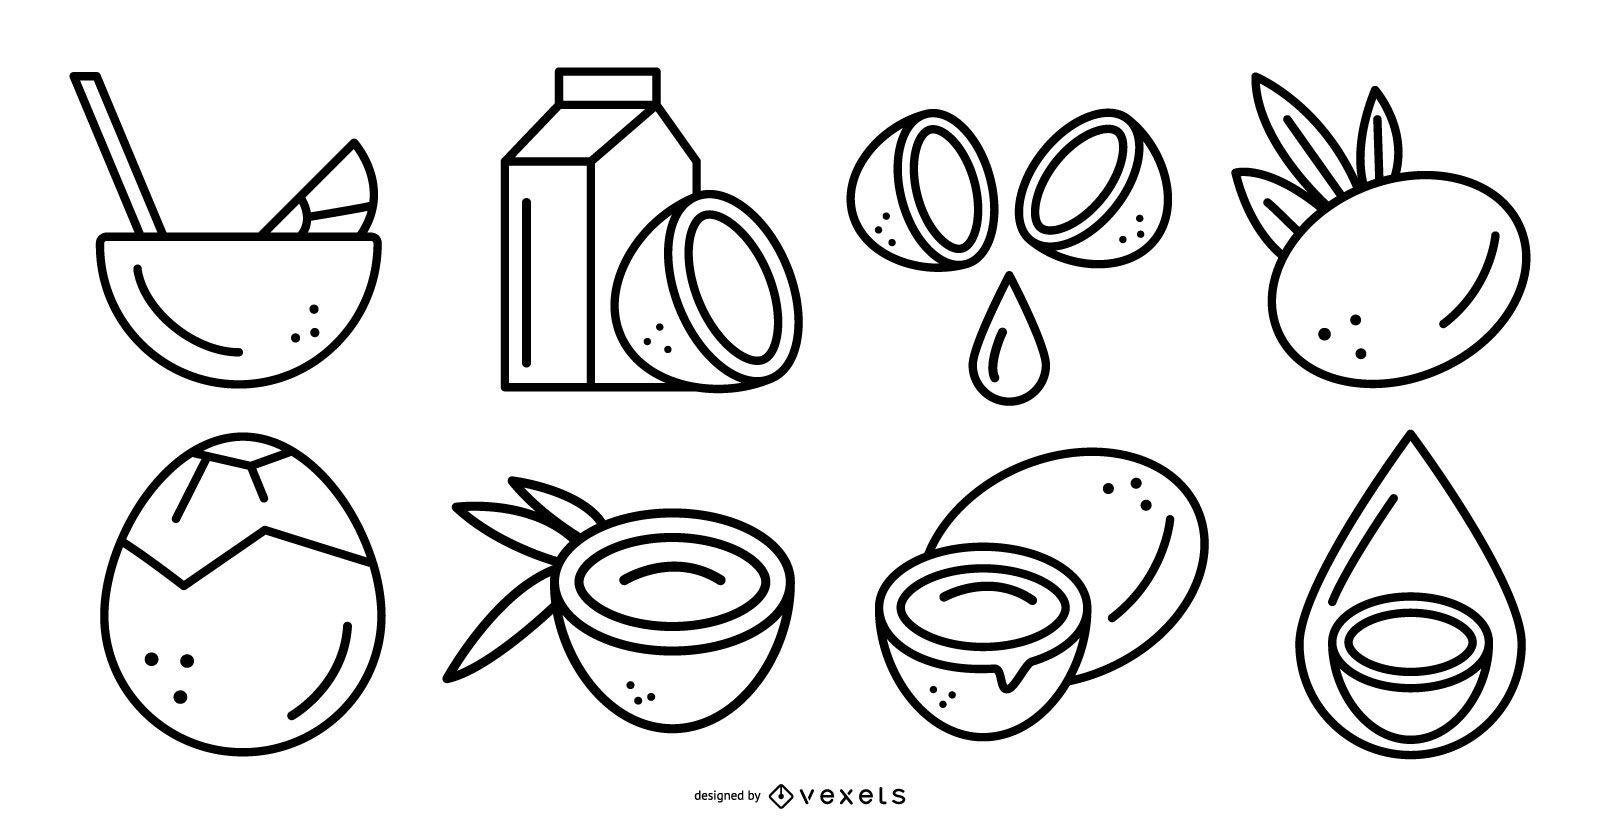 Coconut elements stroke set